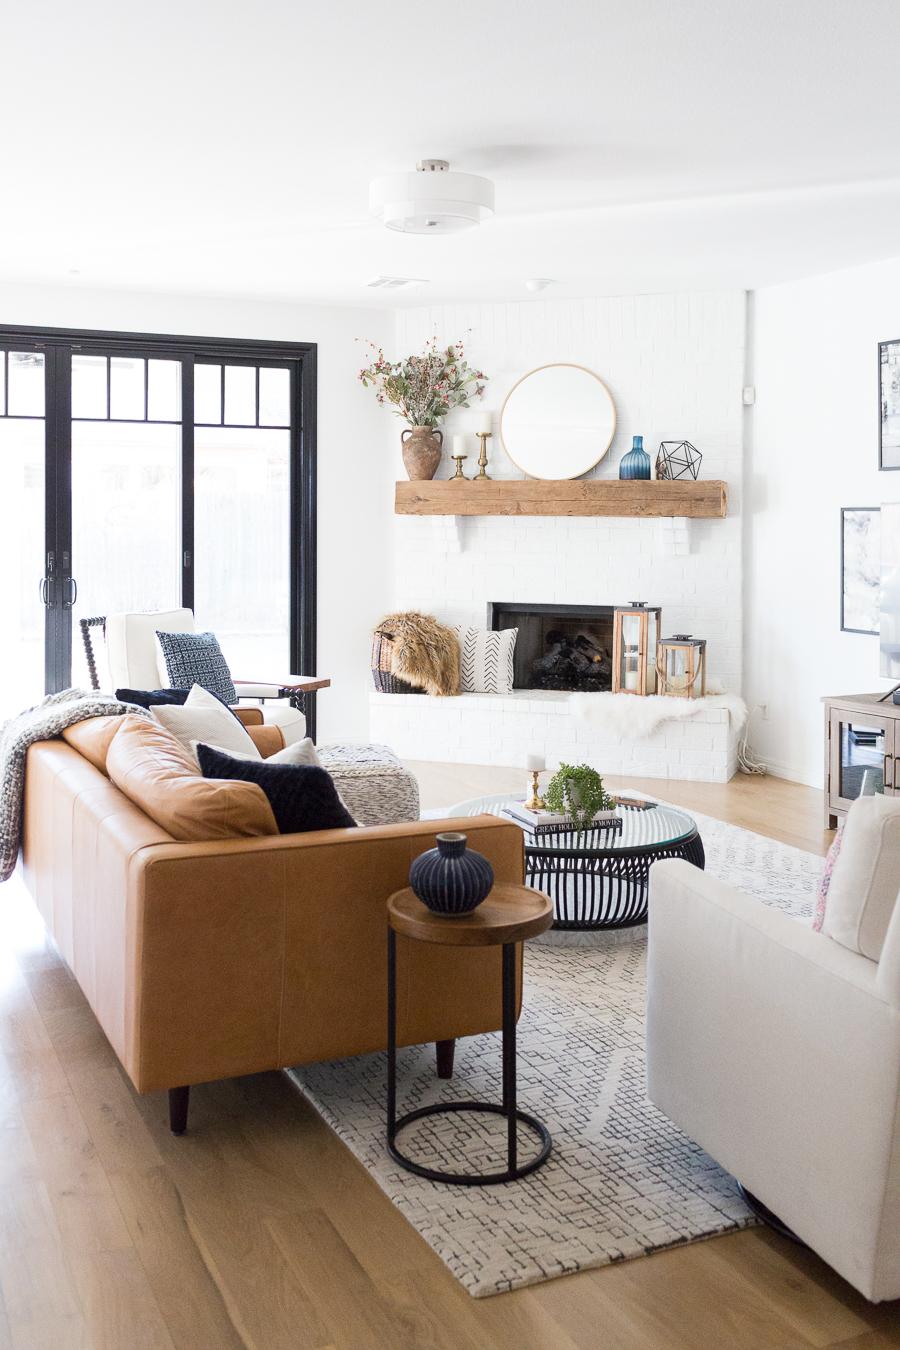 Tulsa-Remodel-Reveal-Modern-White-Farmhouse-black-windows-and-doors-modern-leather-sofa-article-sven-sofa-white-brick-fireplace-wood-beam-mantle-t.jpg